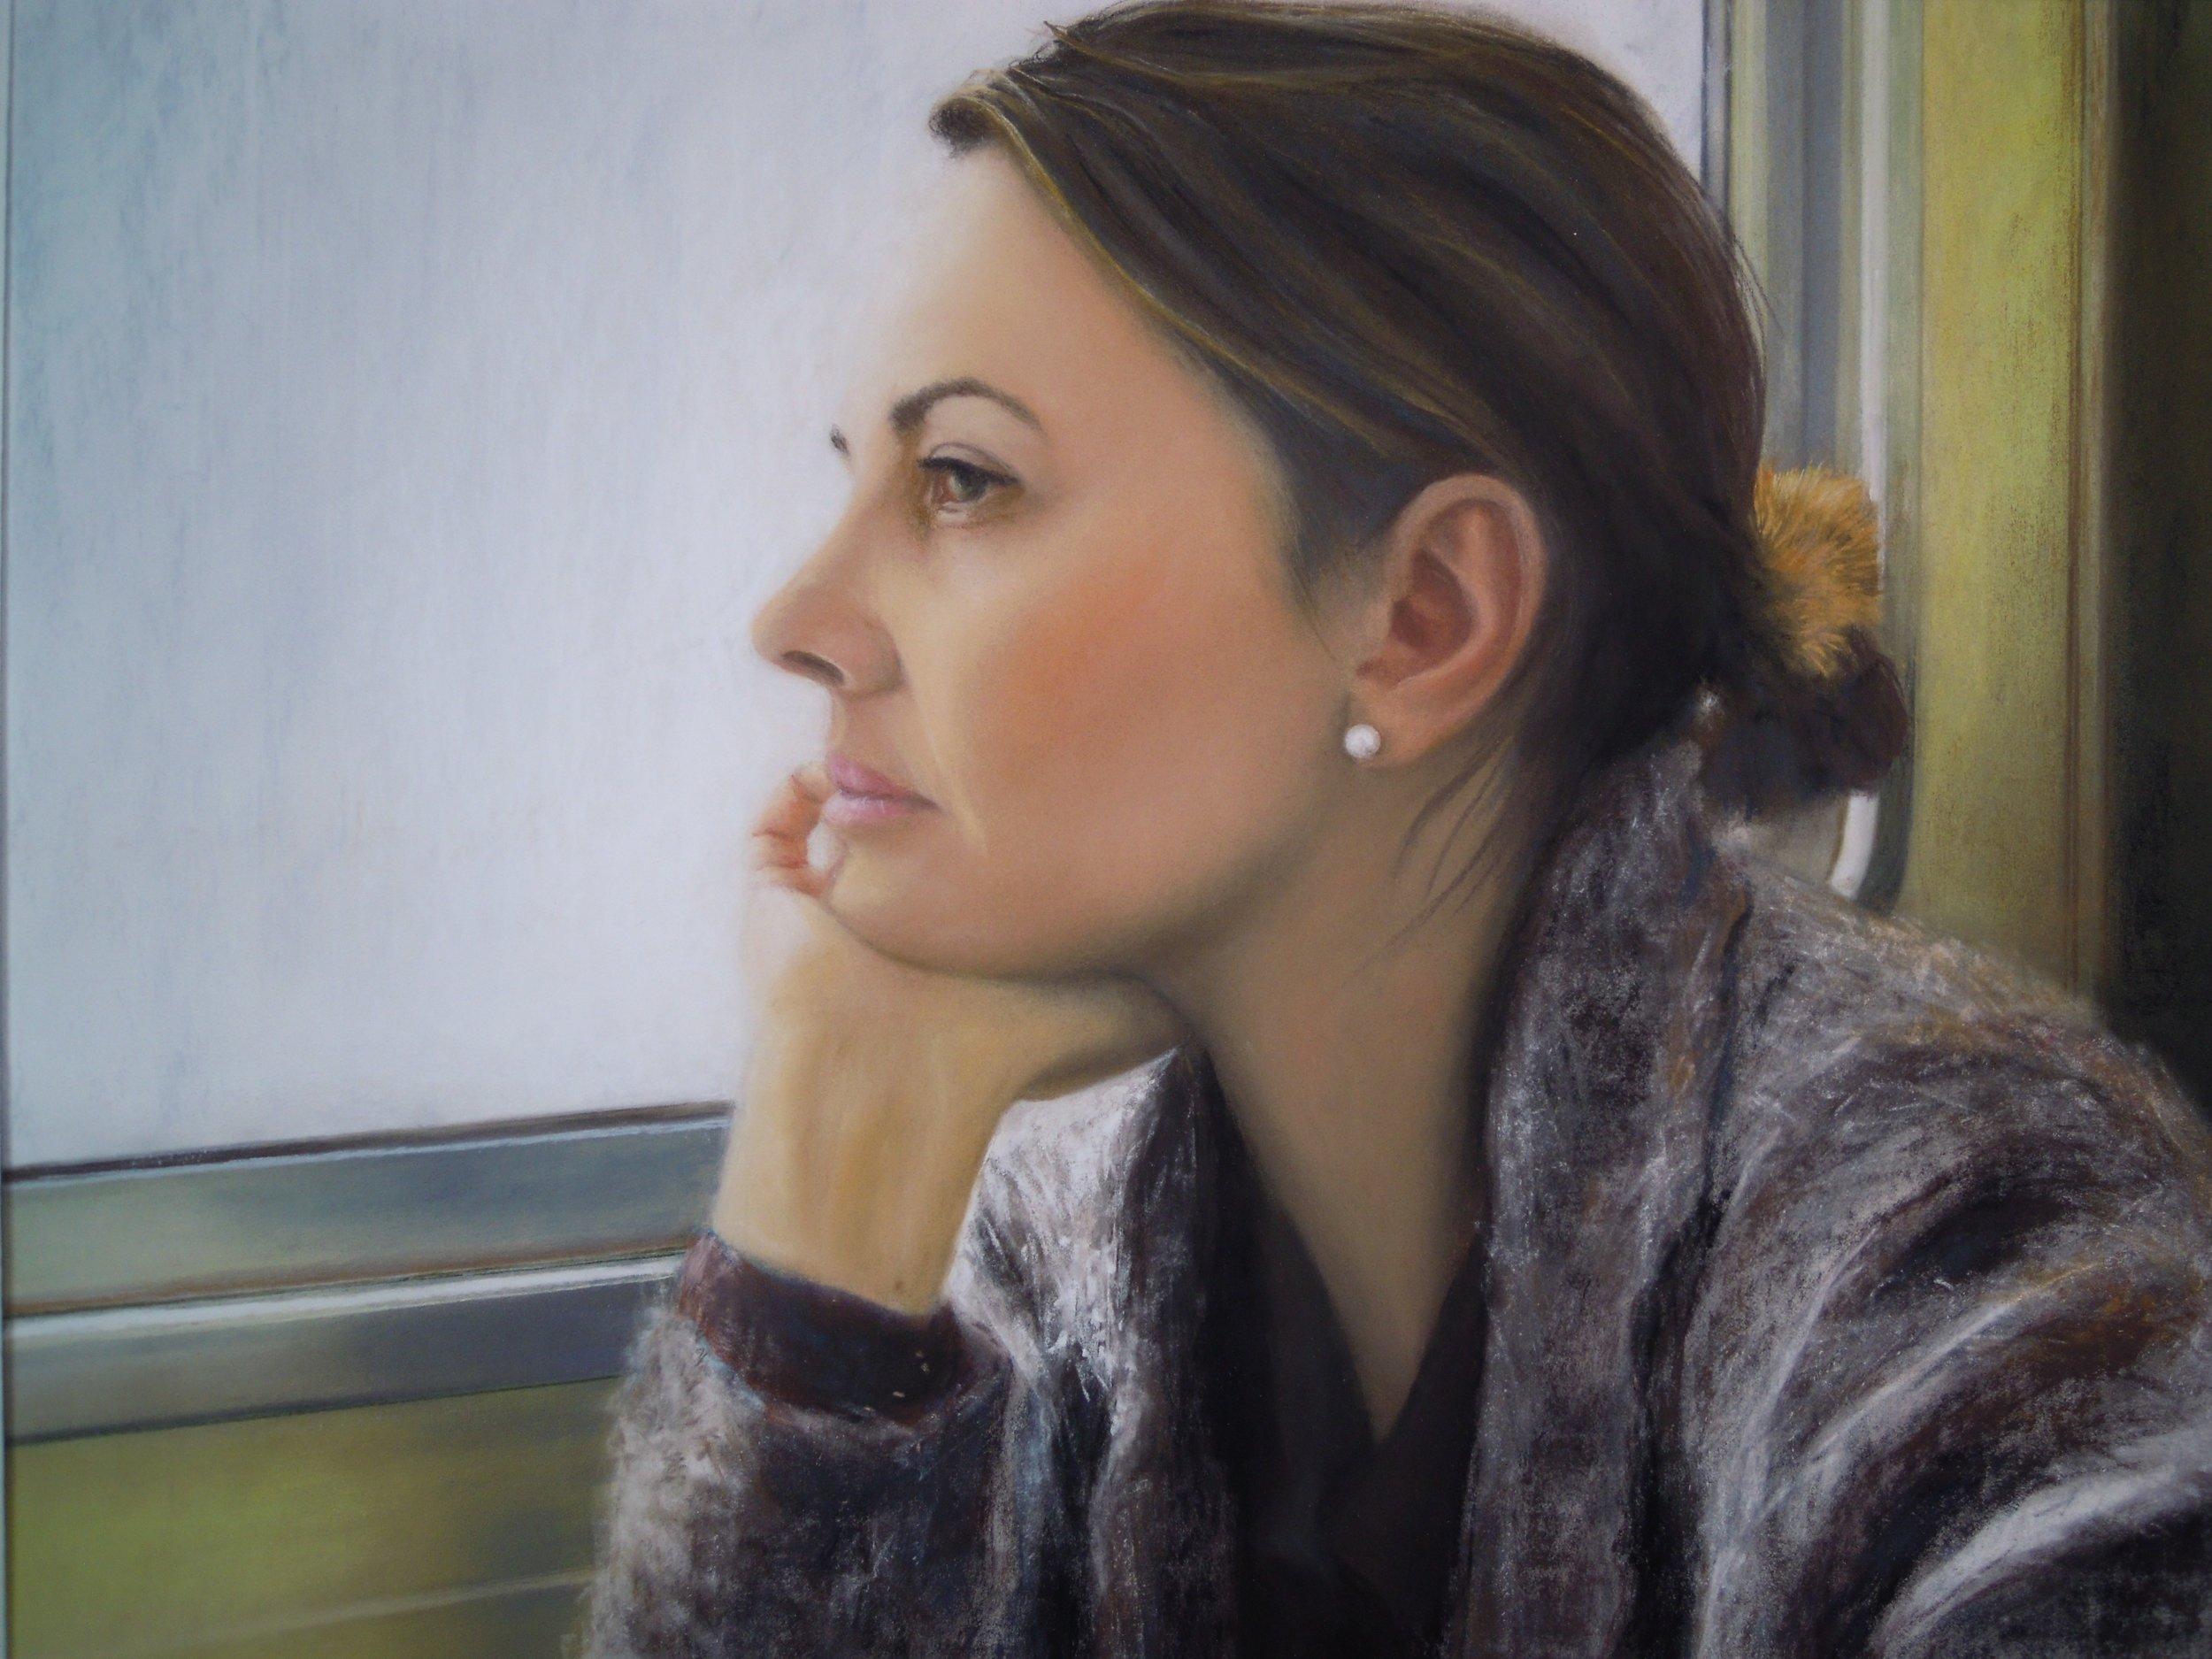 Cristina Piantoni, The extended present., Pastel on paper., 40 cm x 50 cm